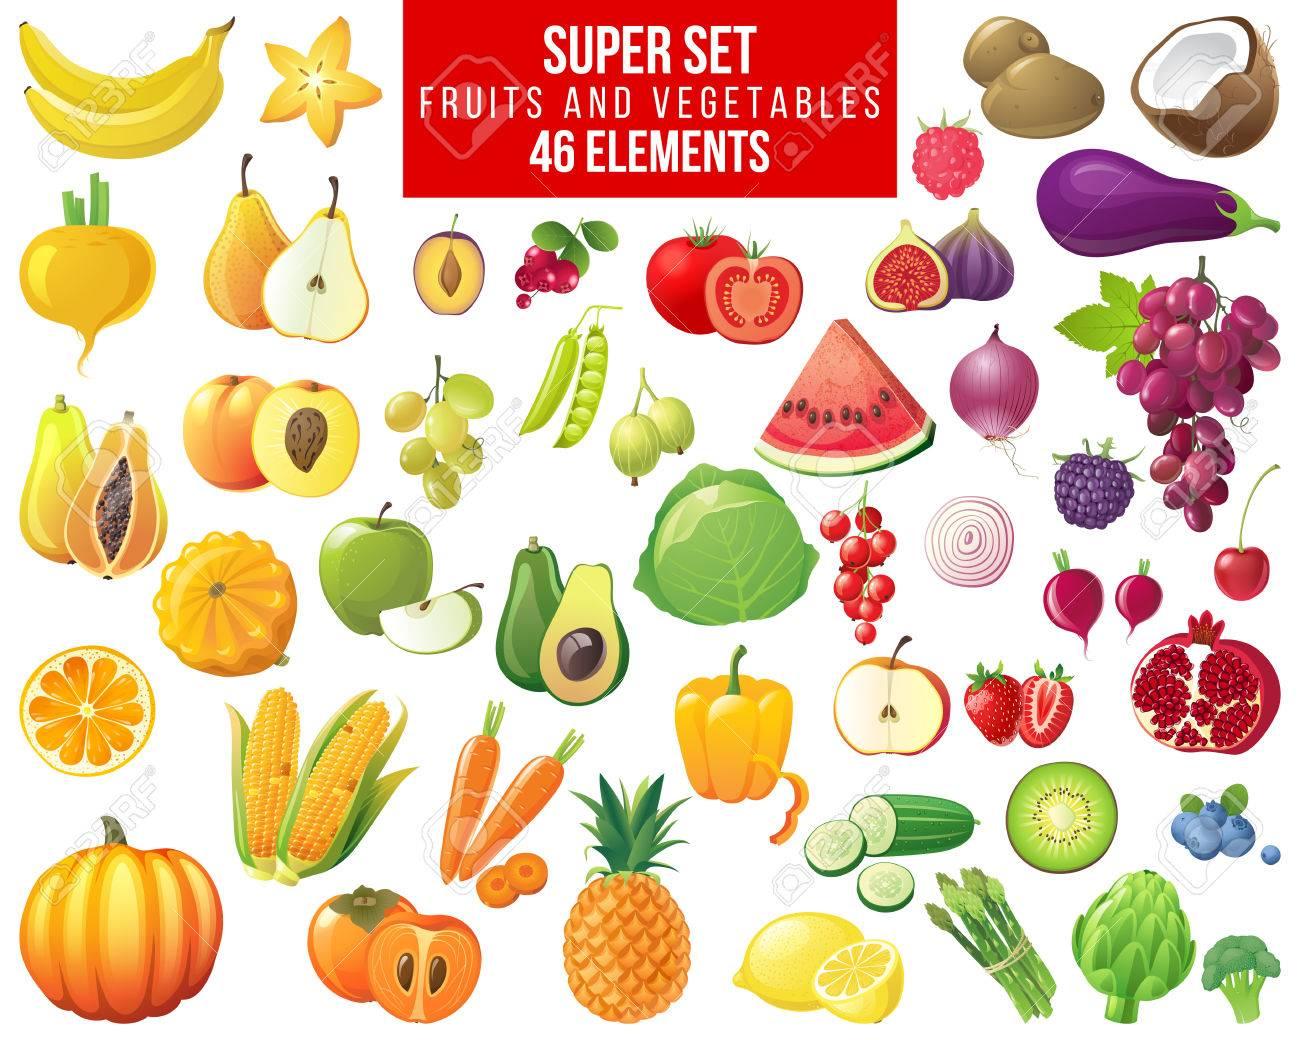 fruits, vegetables and berries super set - 46 elements - 64111443